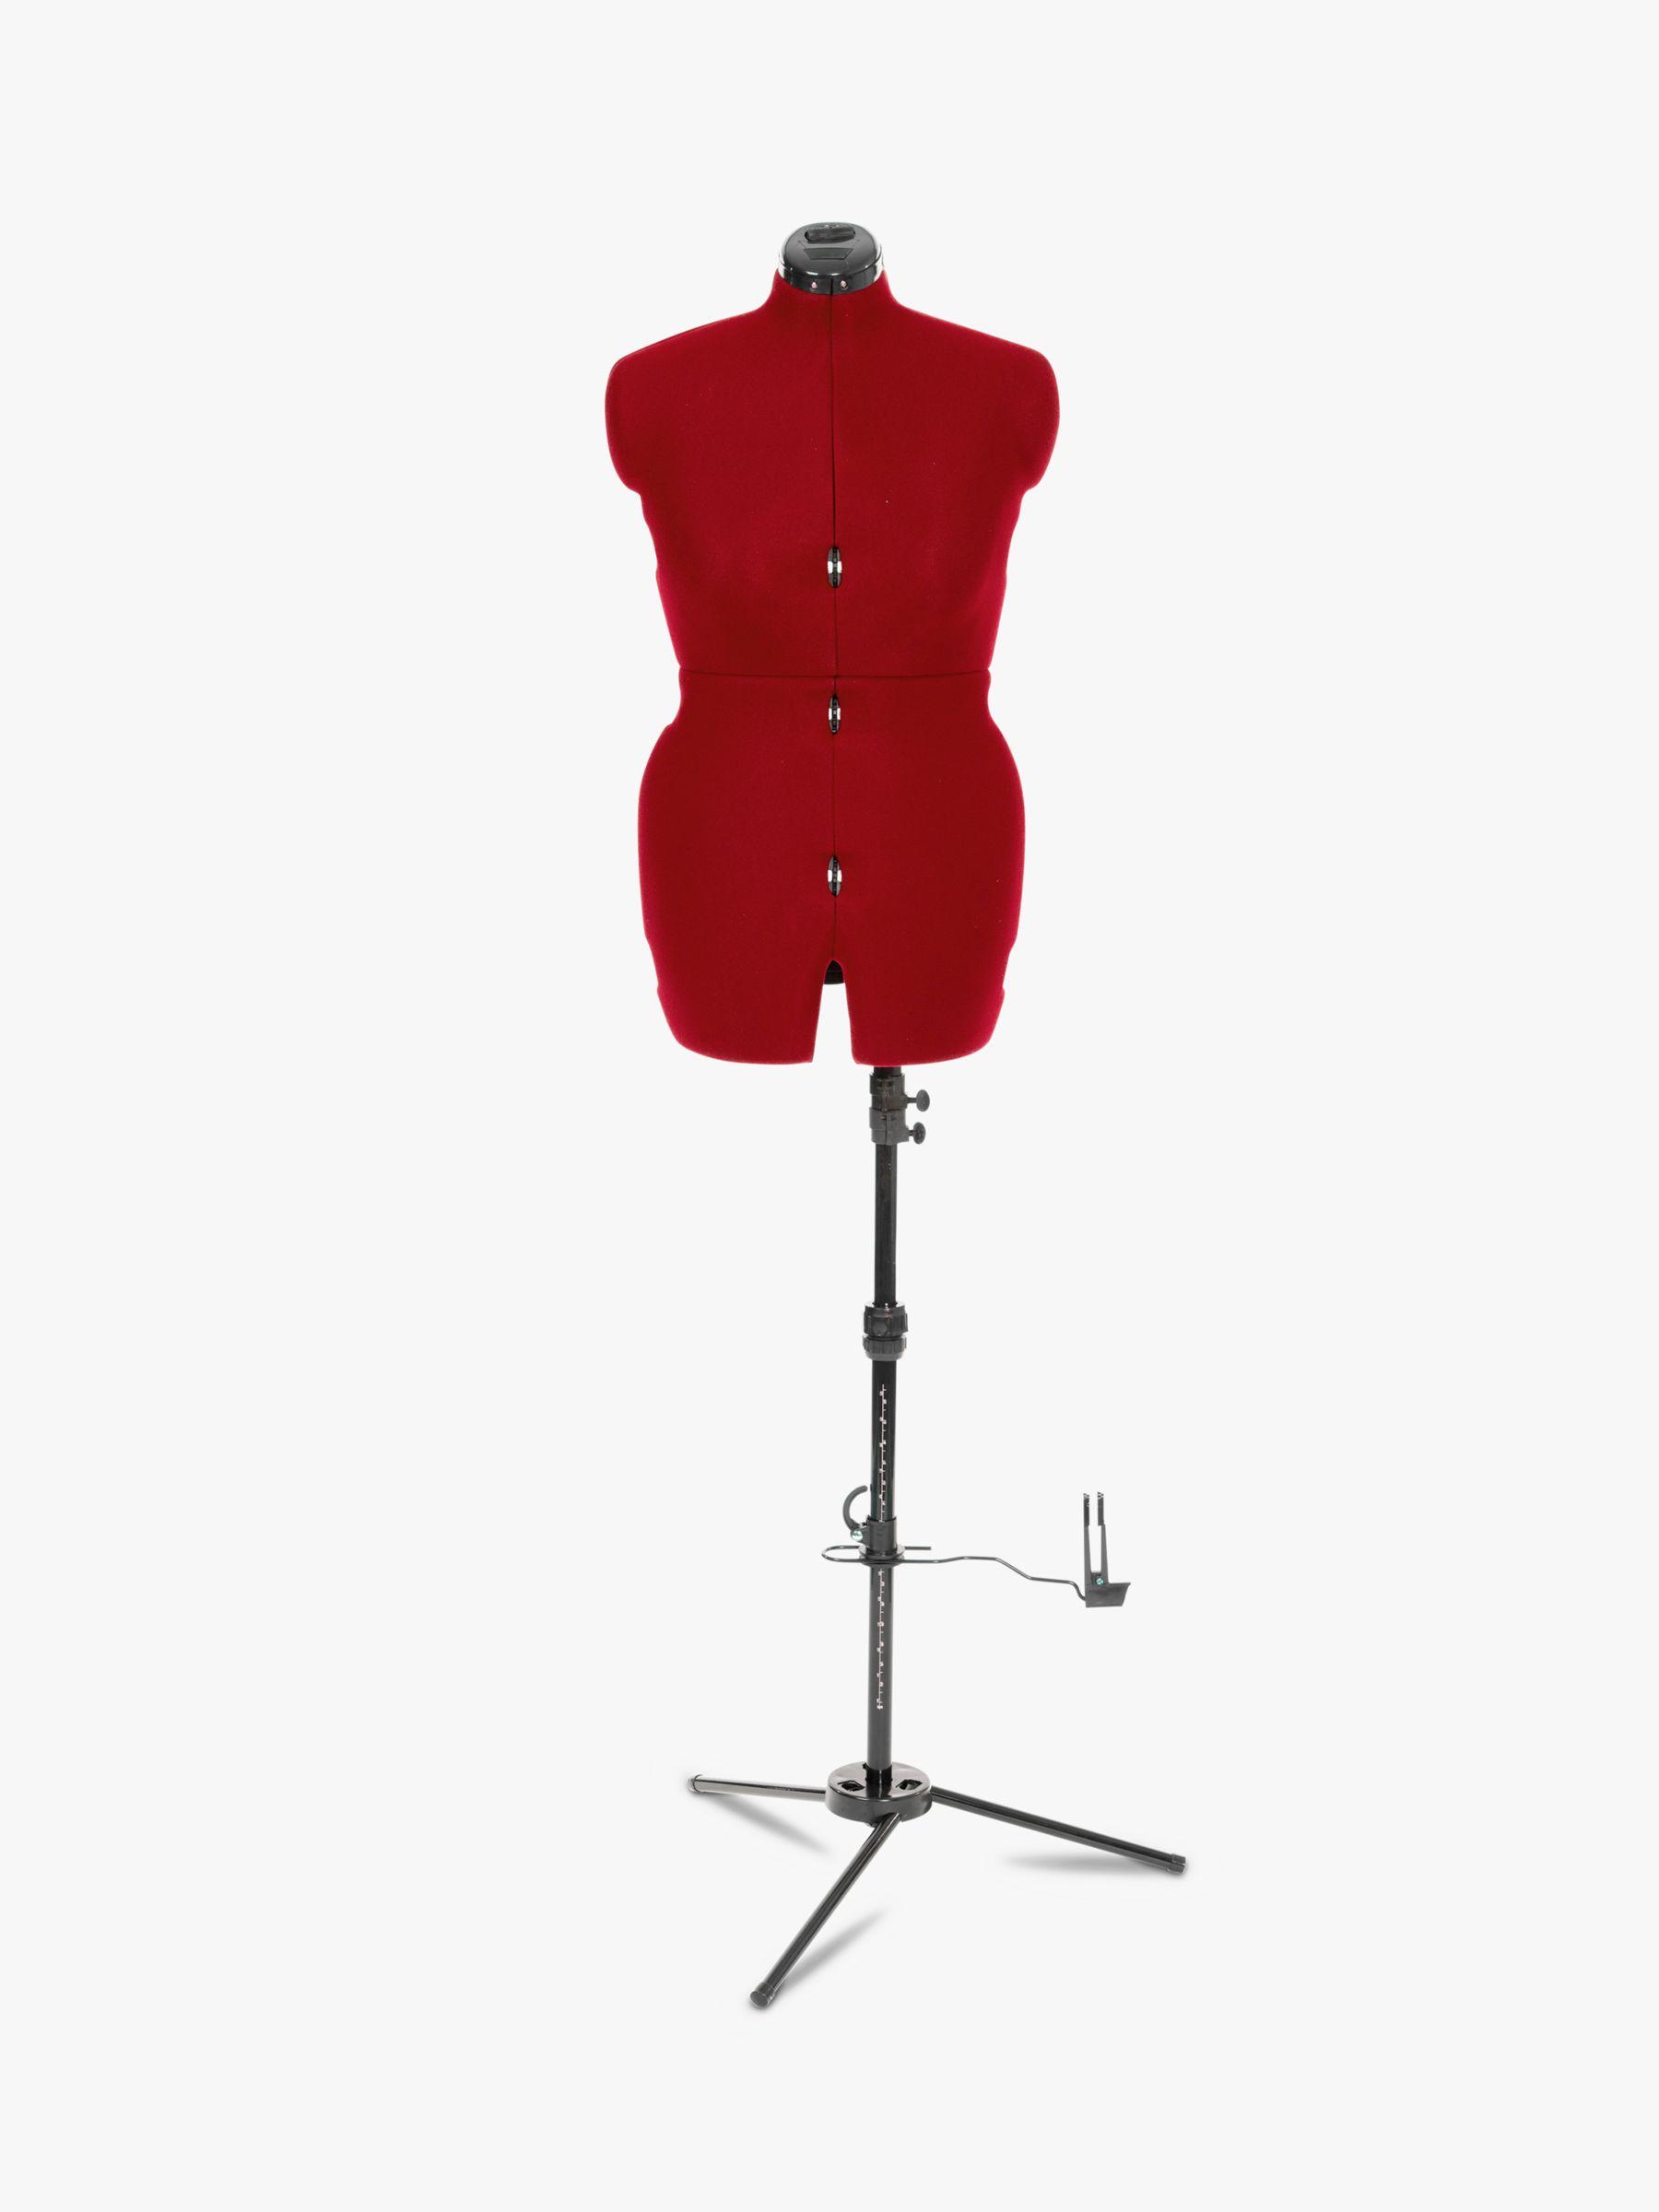 Adjustoform Adjustoform Sew Deluxe Dressmaking Mannequin, Cherry